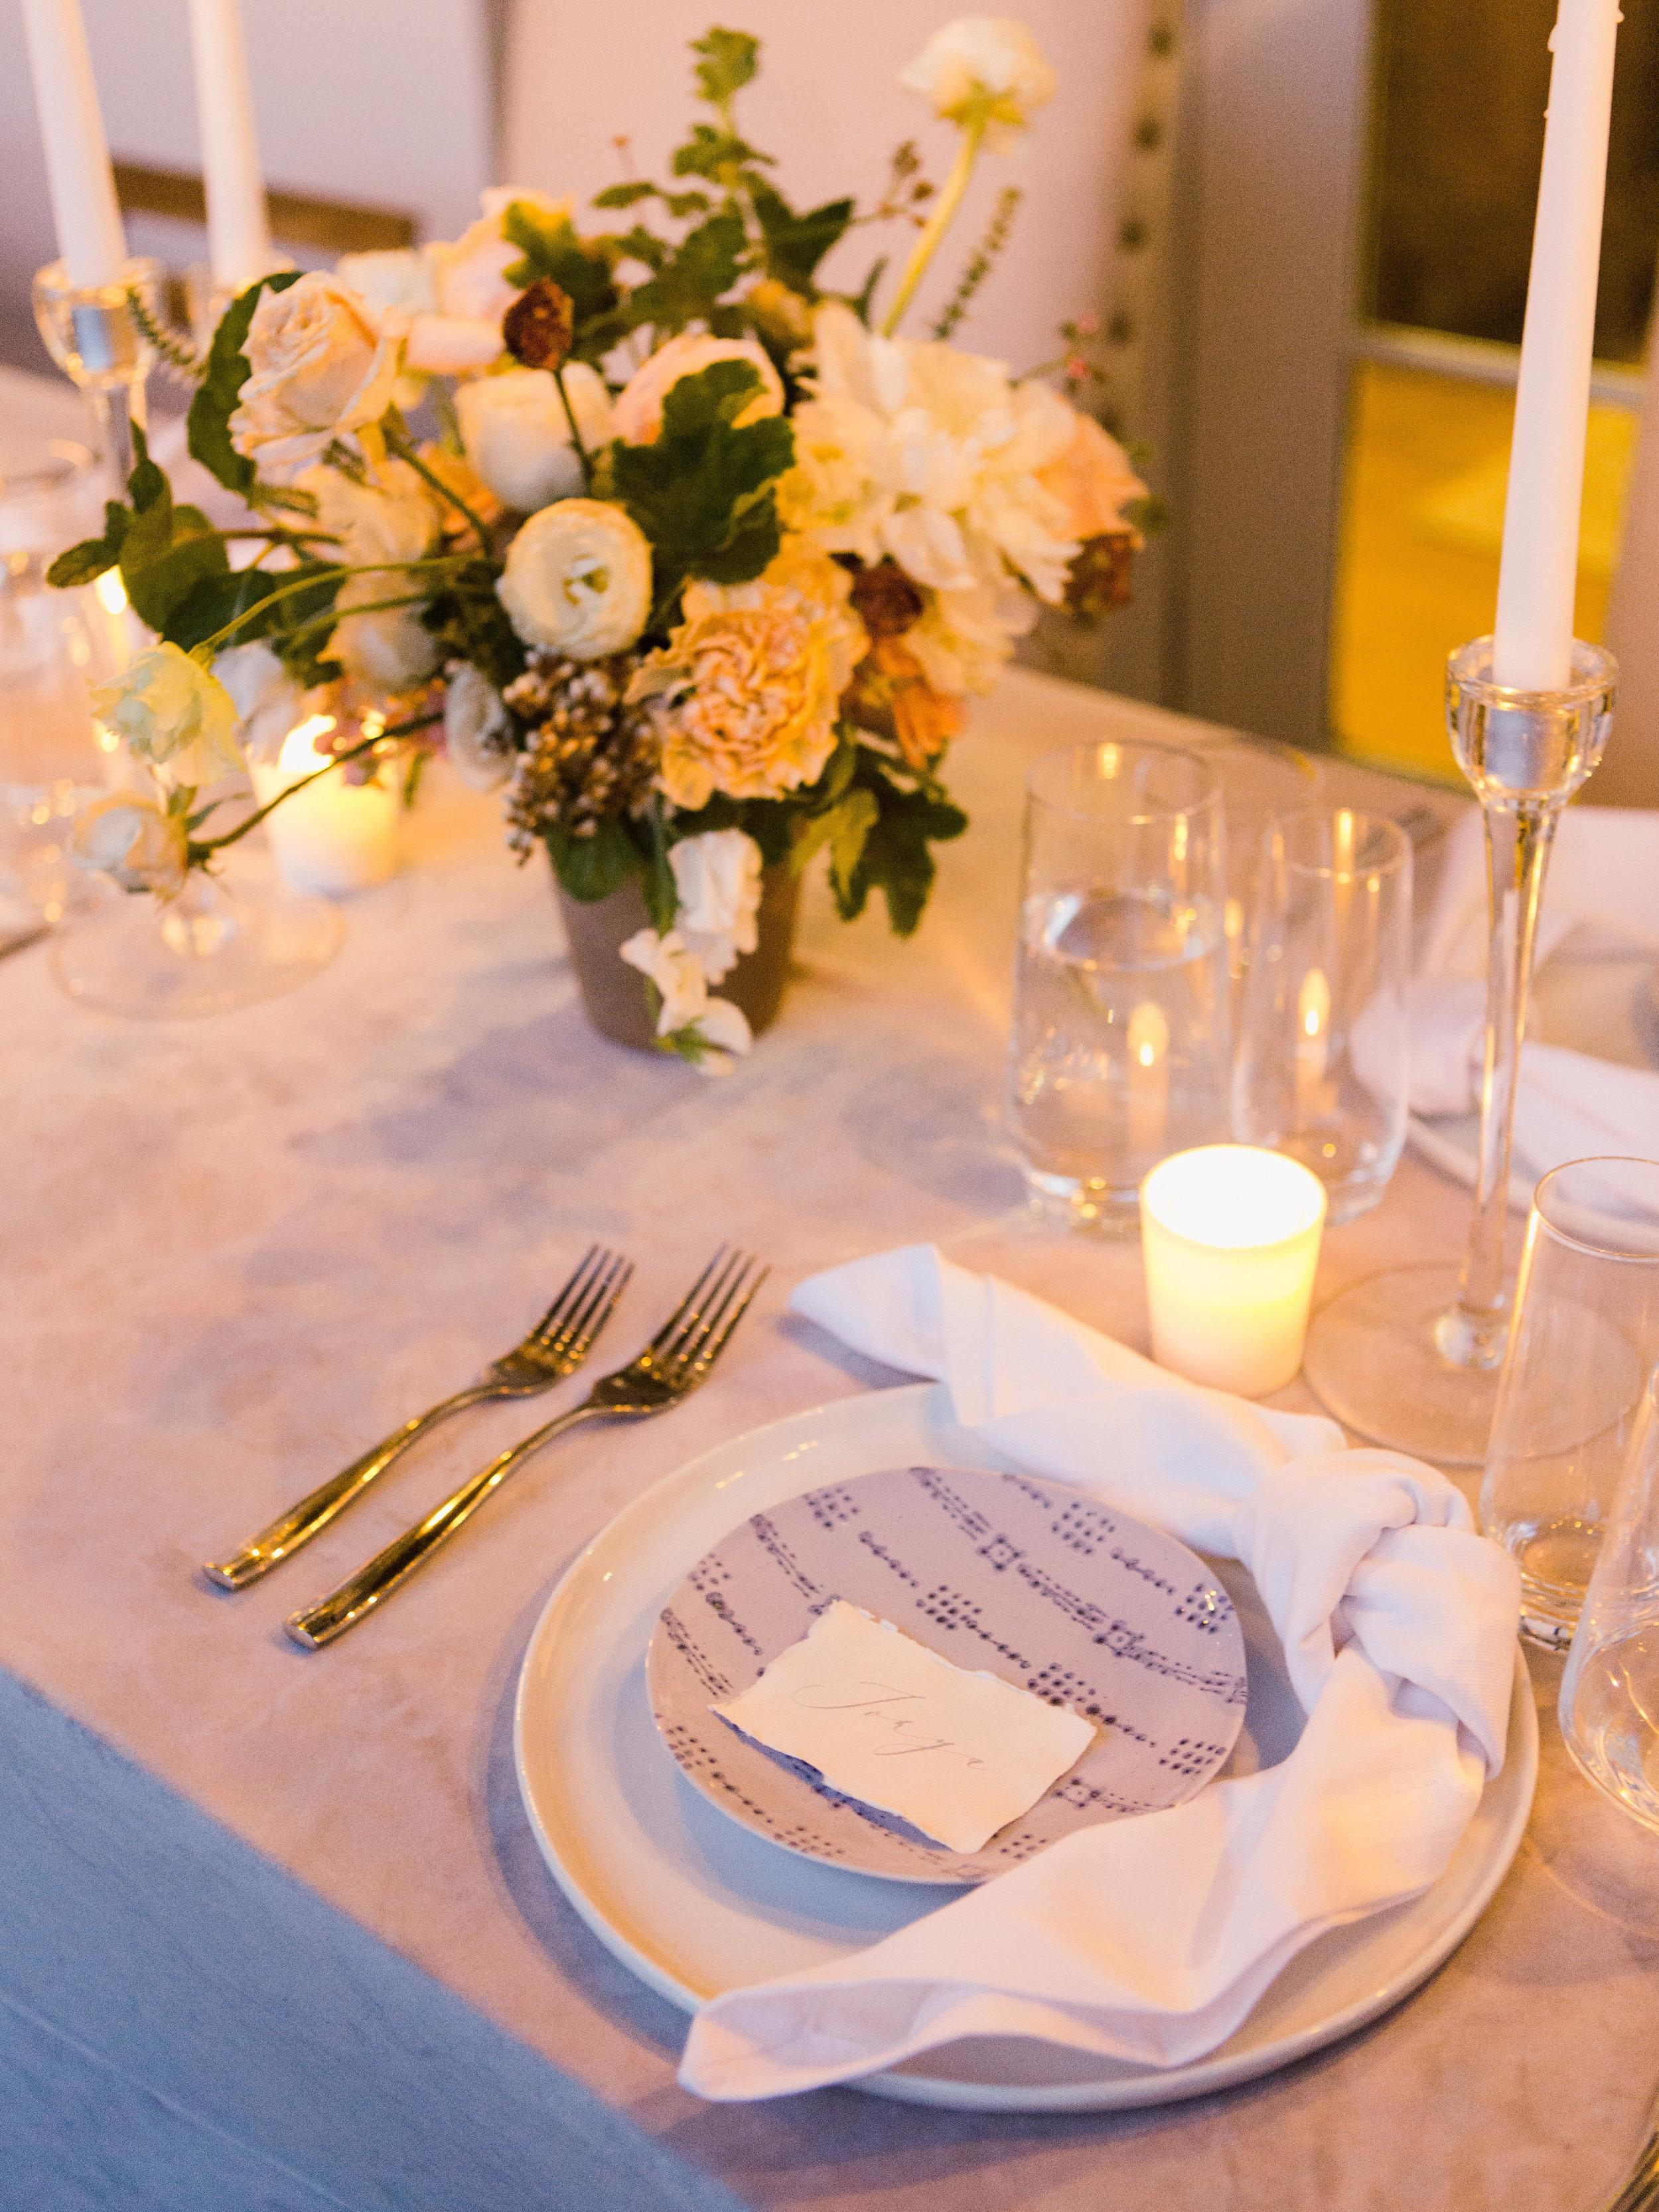 jessica-zimmerman-events-wedding-intimate-reception-place-setting.jpg